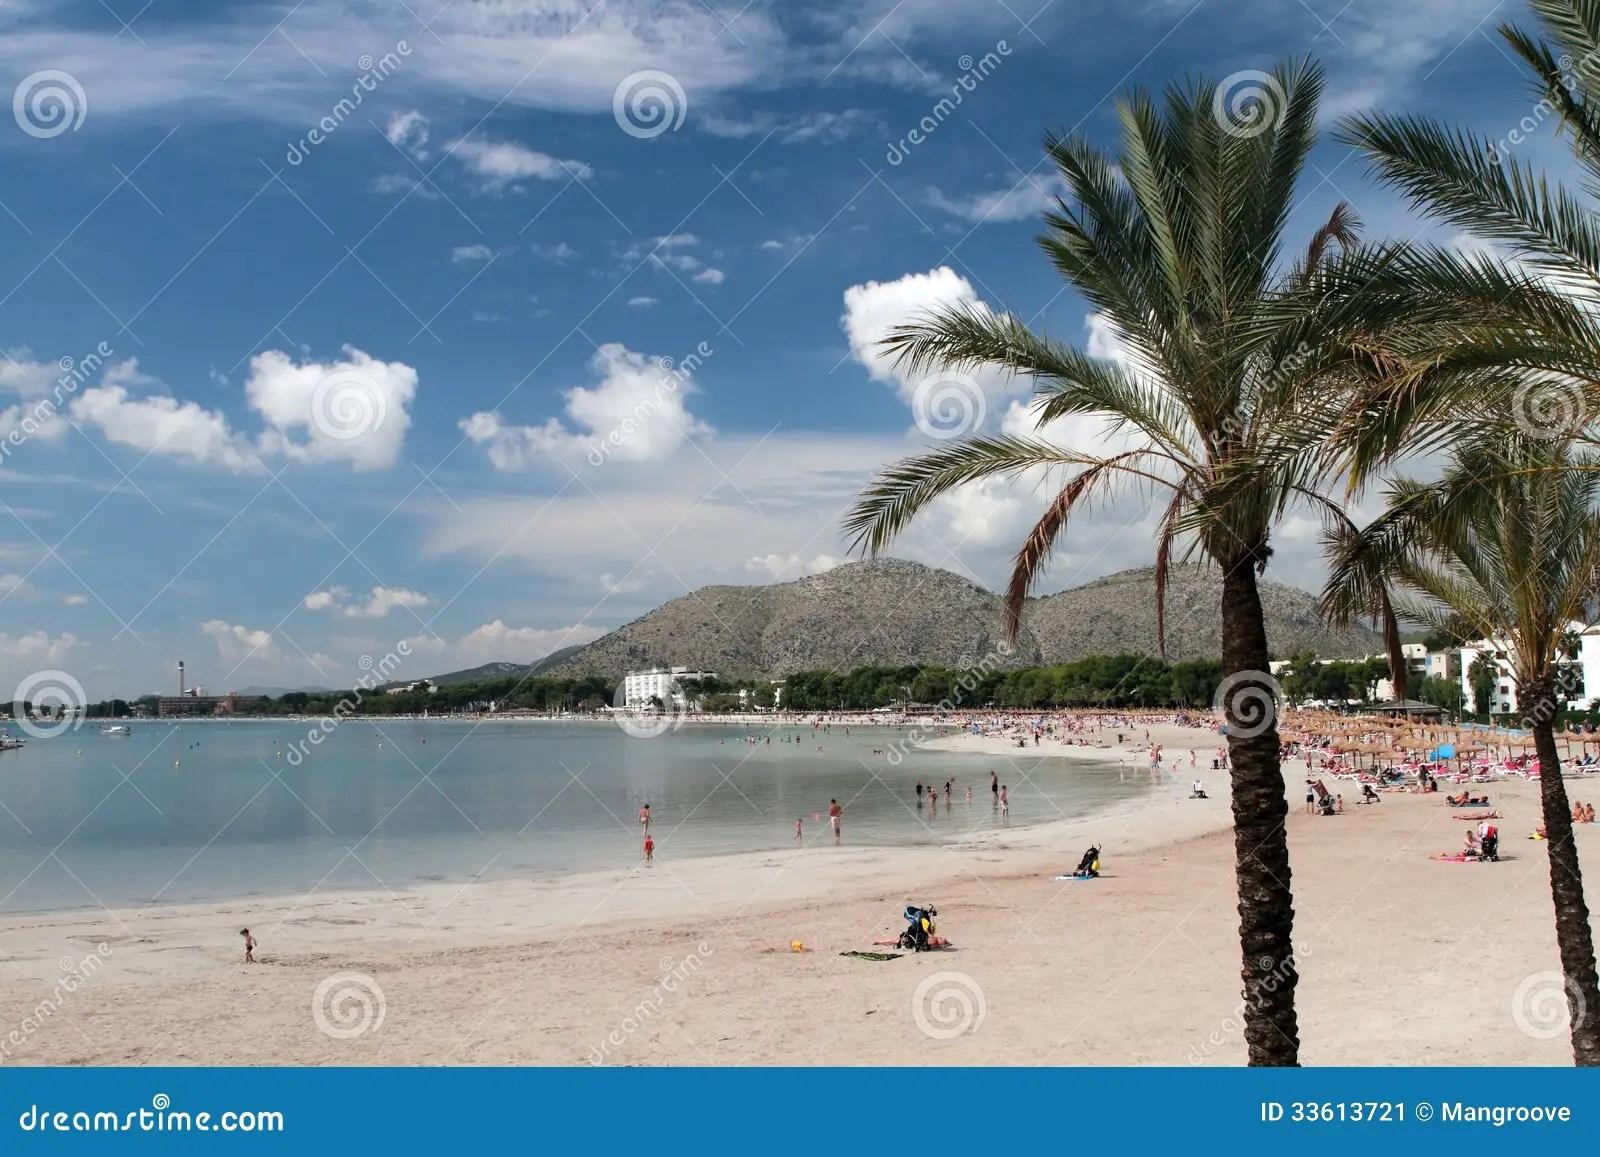 850 mallorca strand alcudia fotos kostenlose und royalty free stock fotos von dreamstime